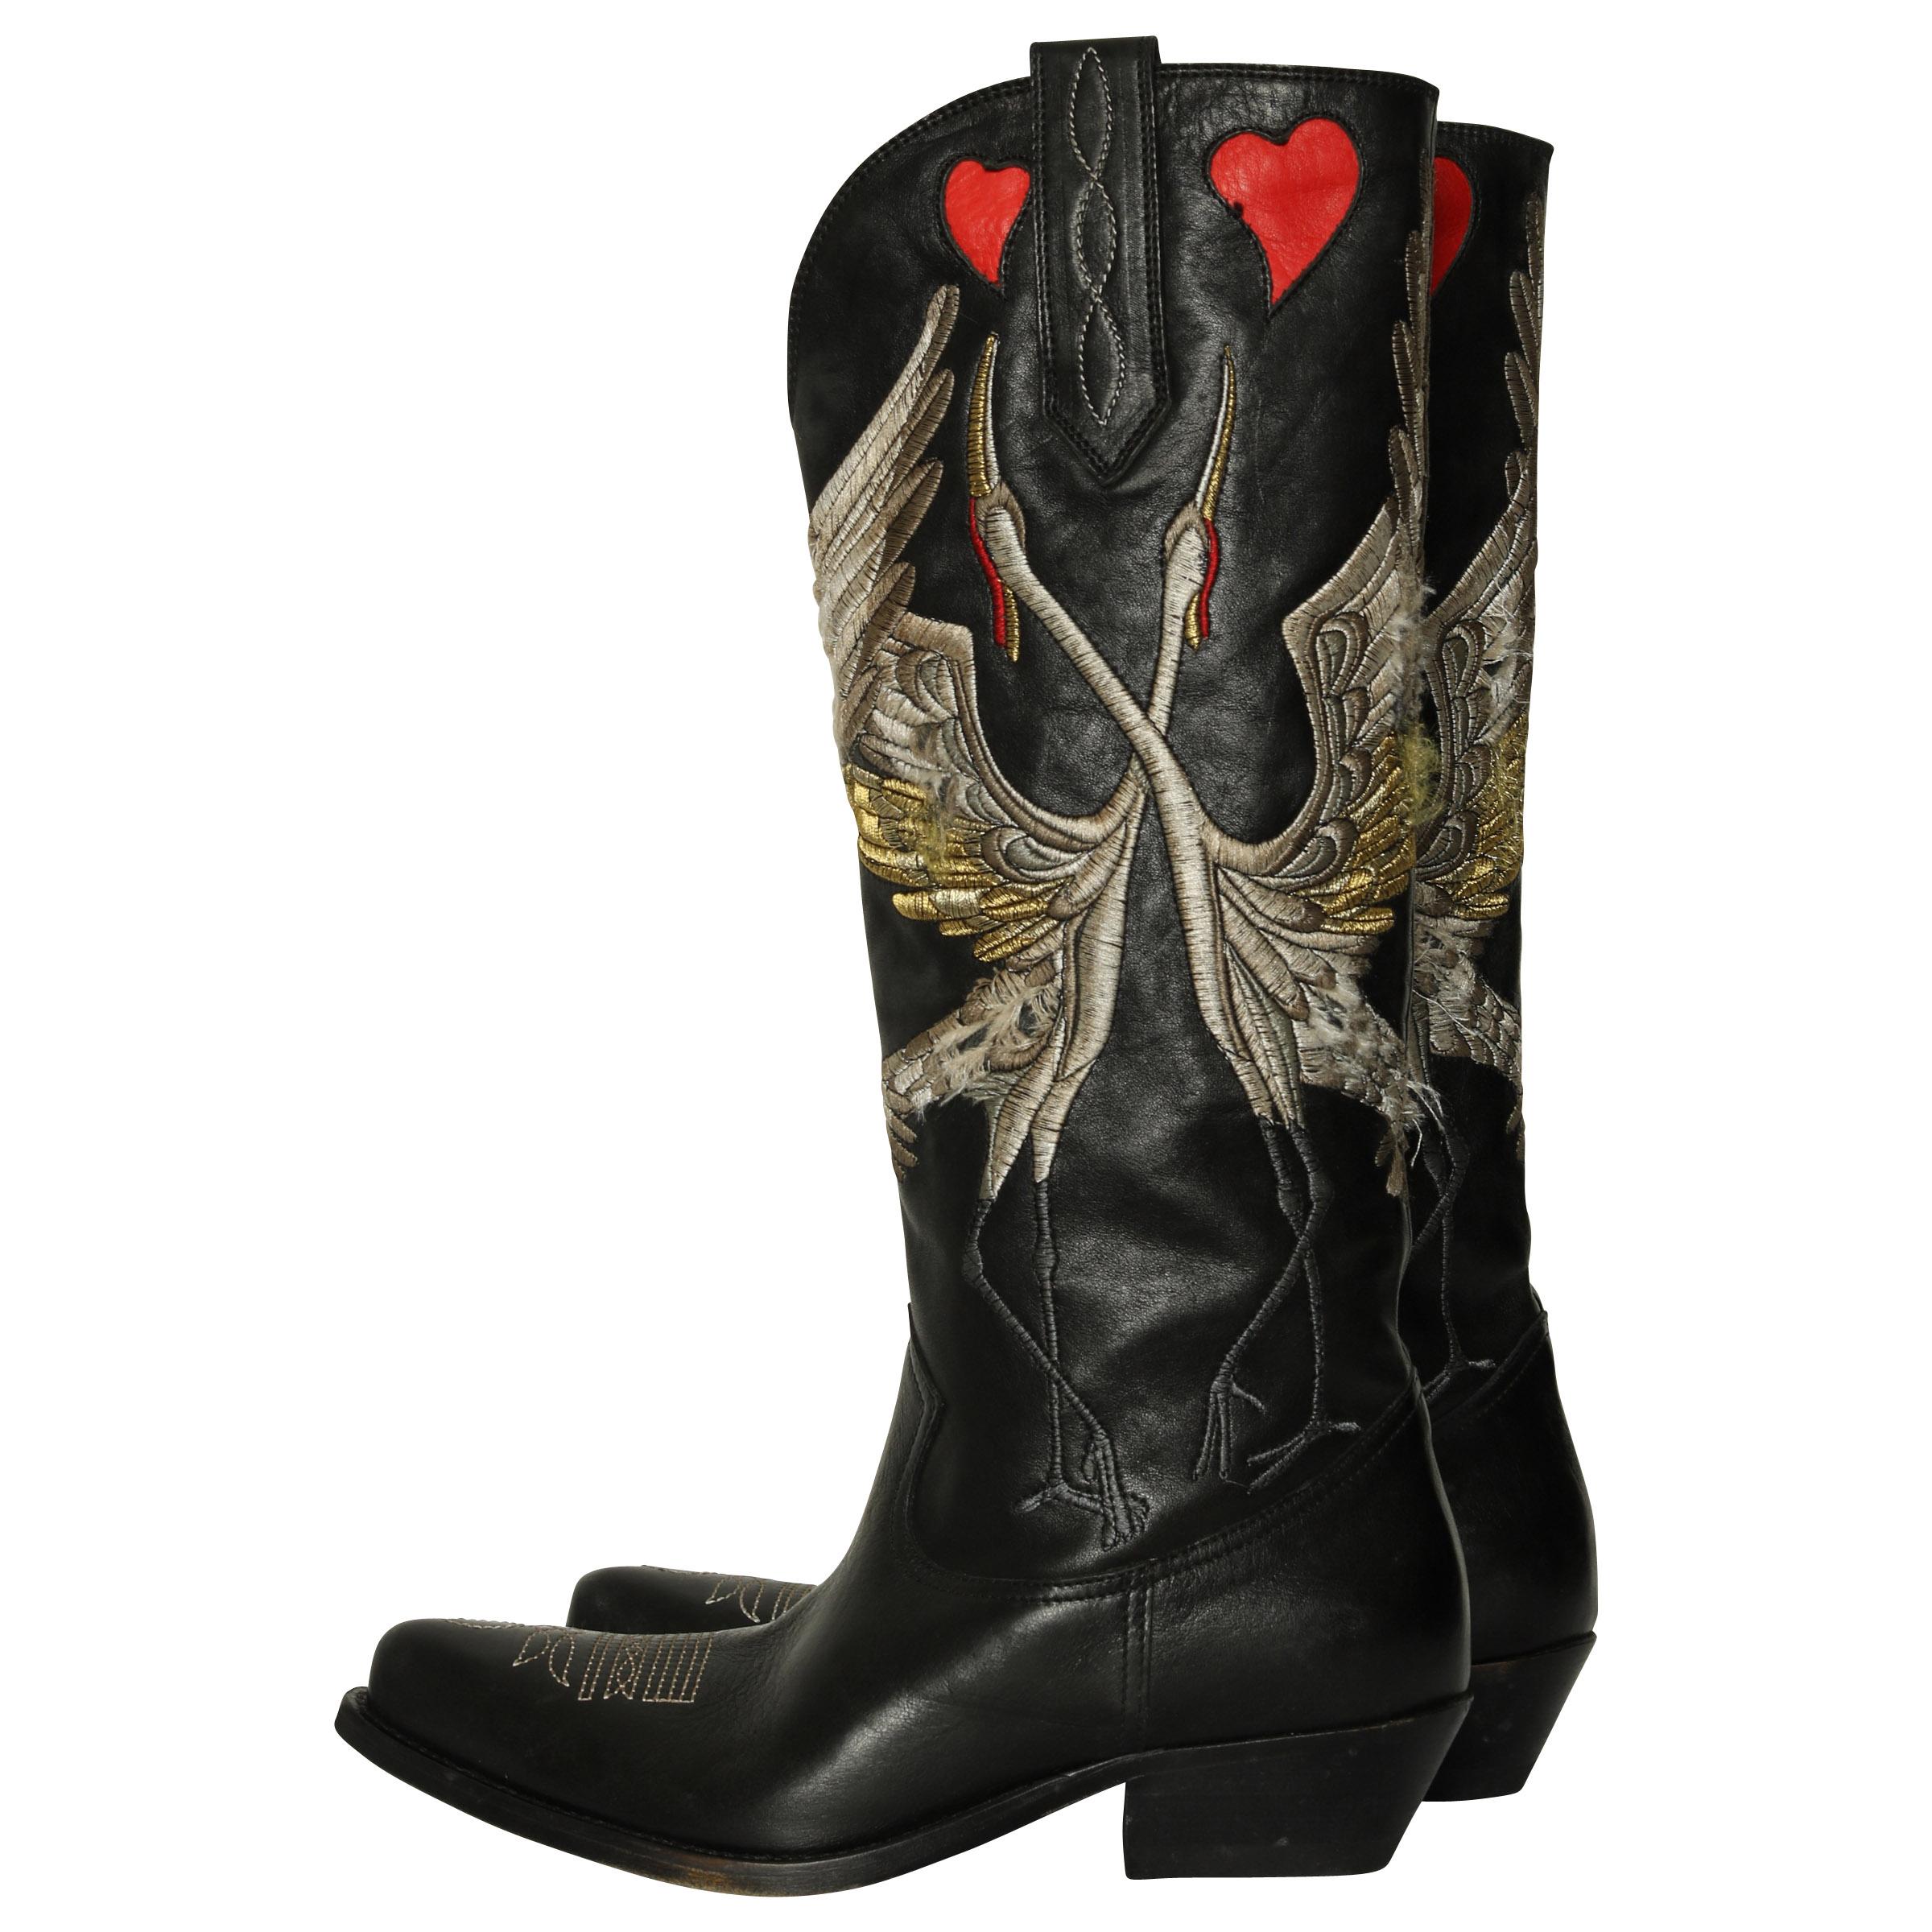 Golden Goose Boots Wish Star Black Love